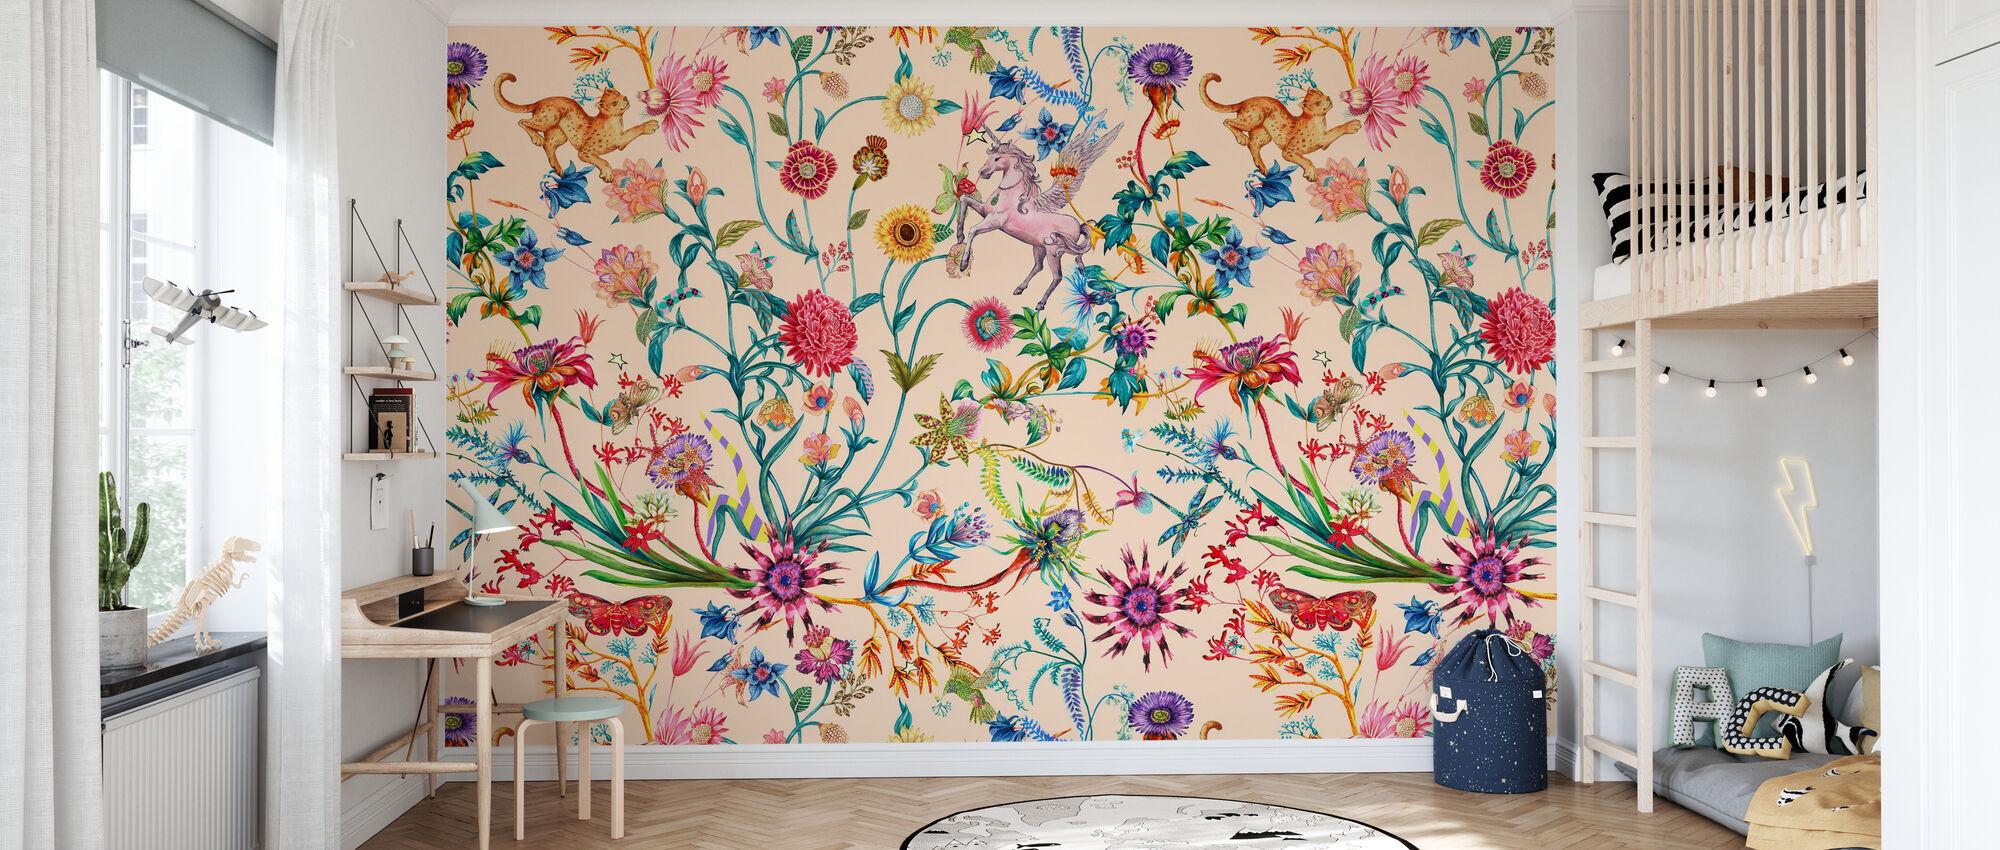 Daydreaming - Peach - Wallpaper - Kids Room